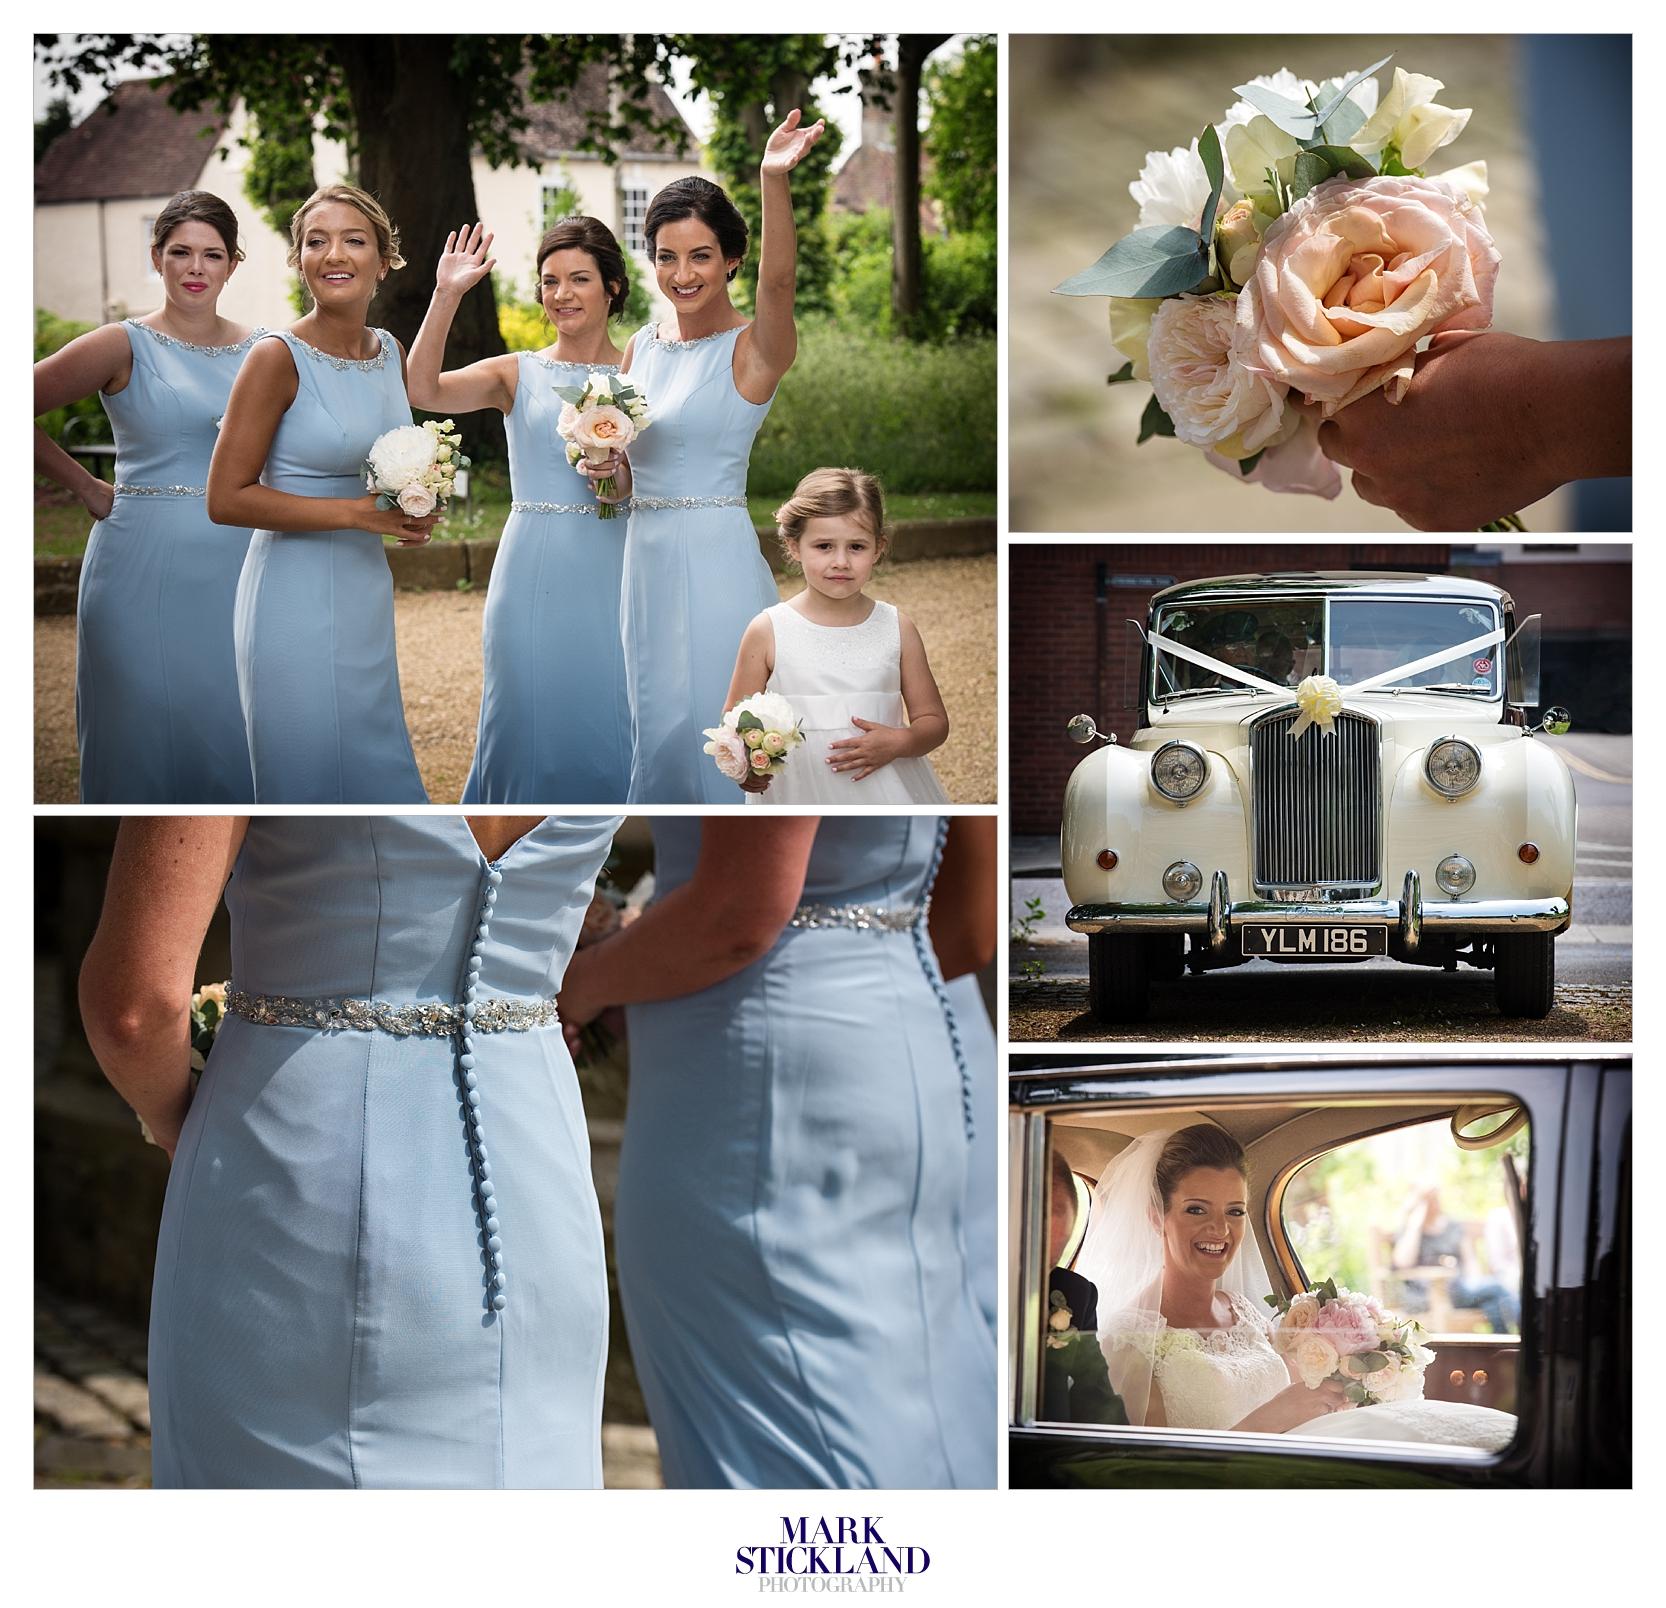 007.deans_court_wedding_wimborne_dorset